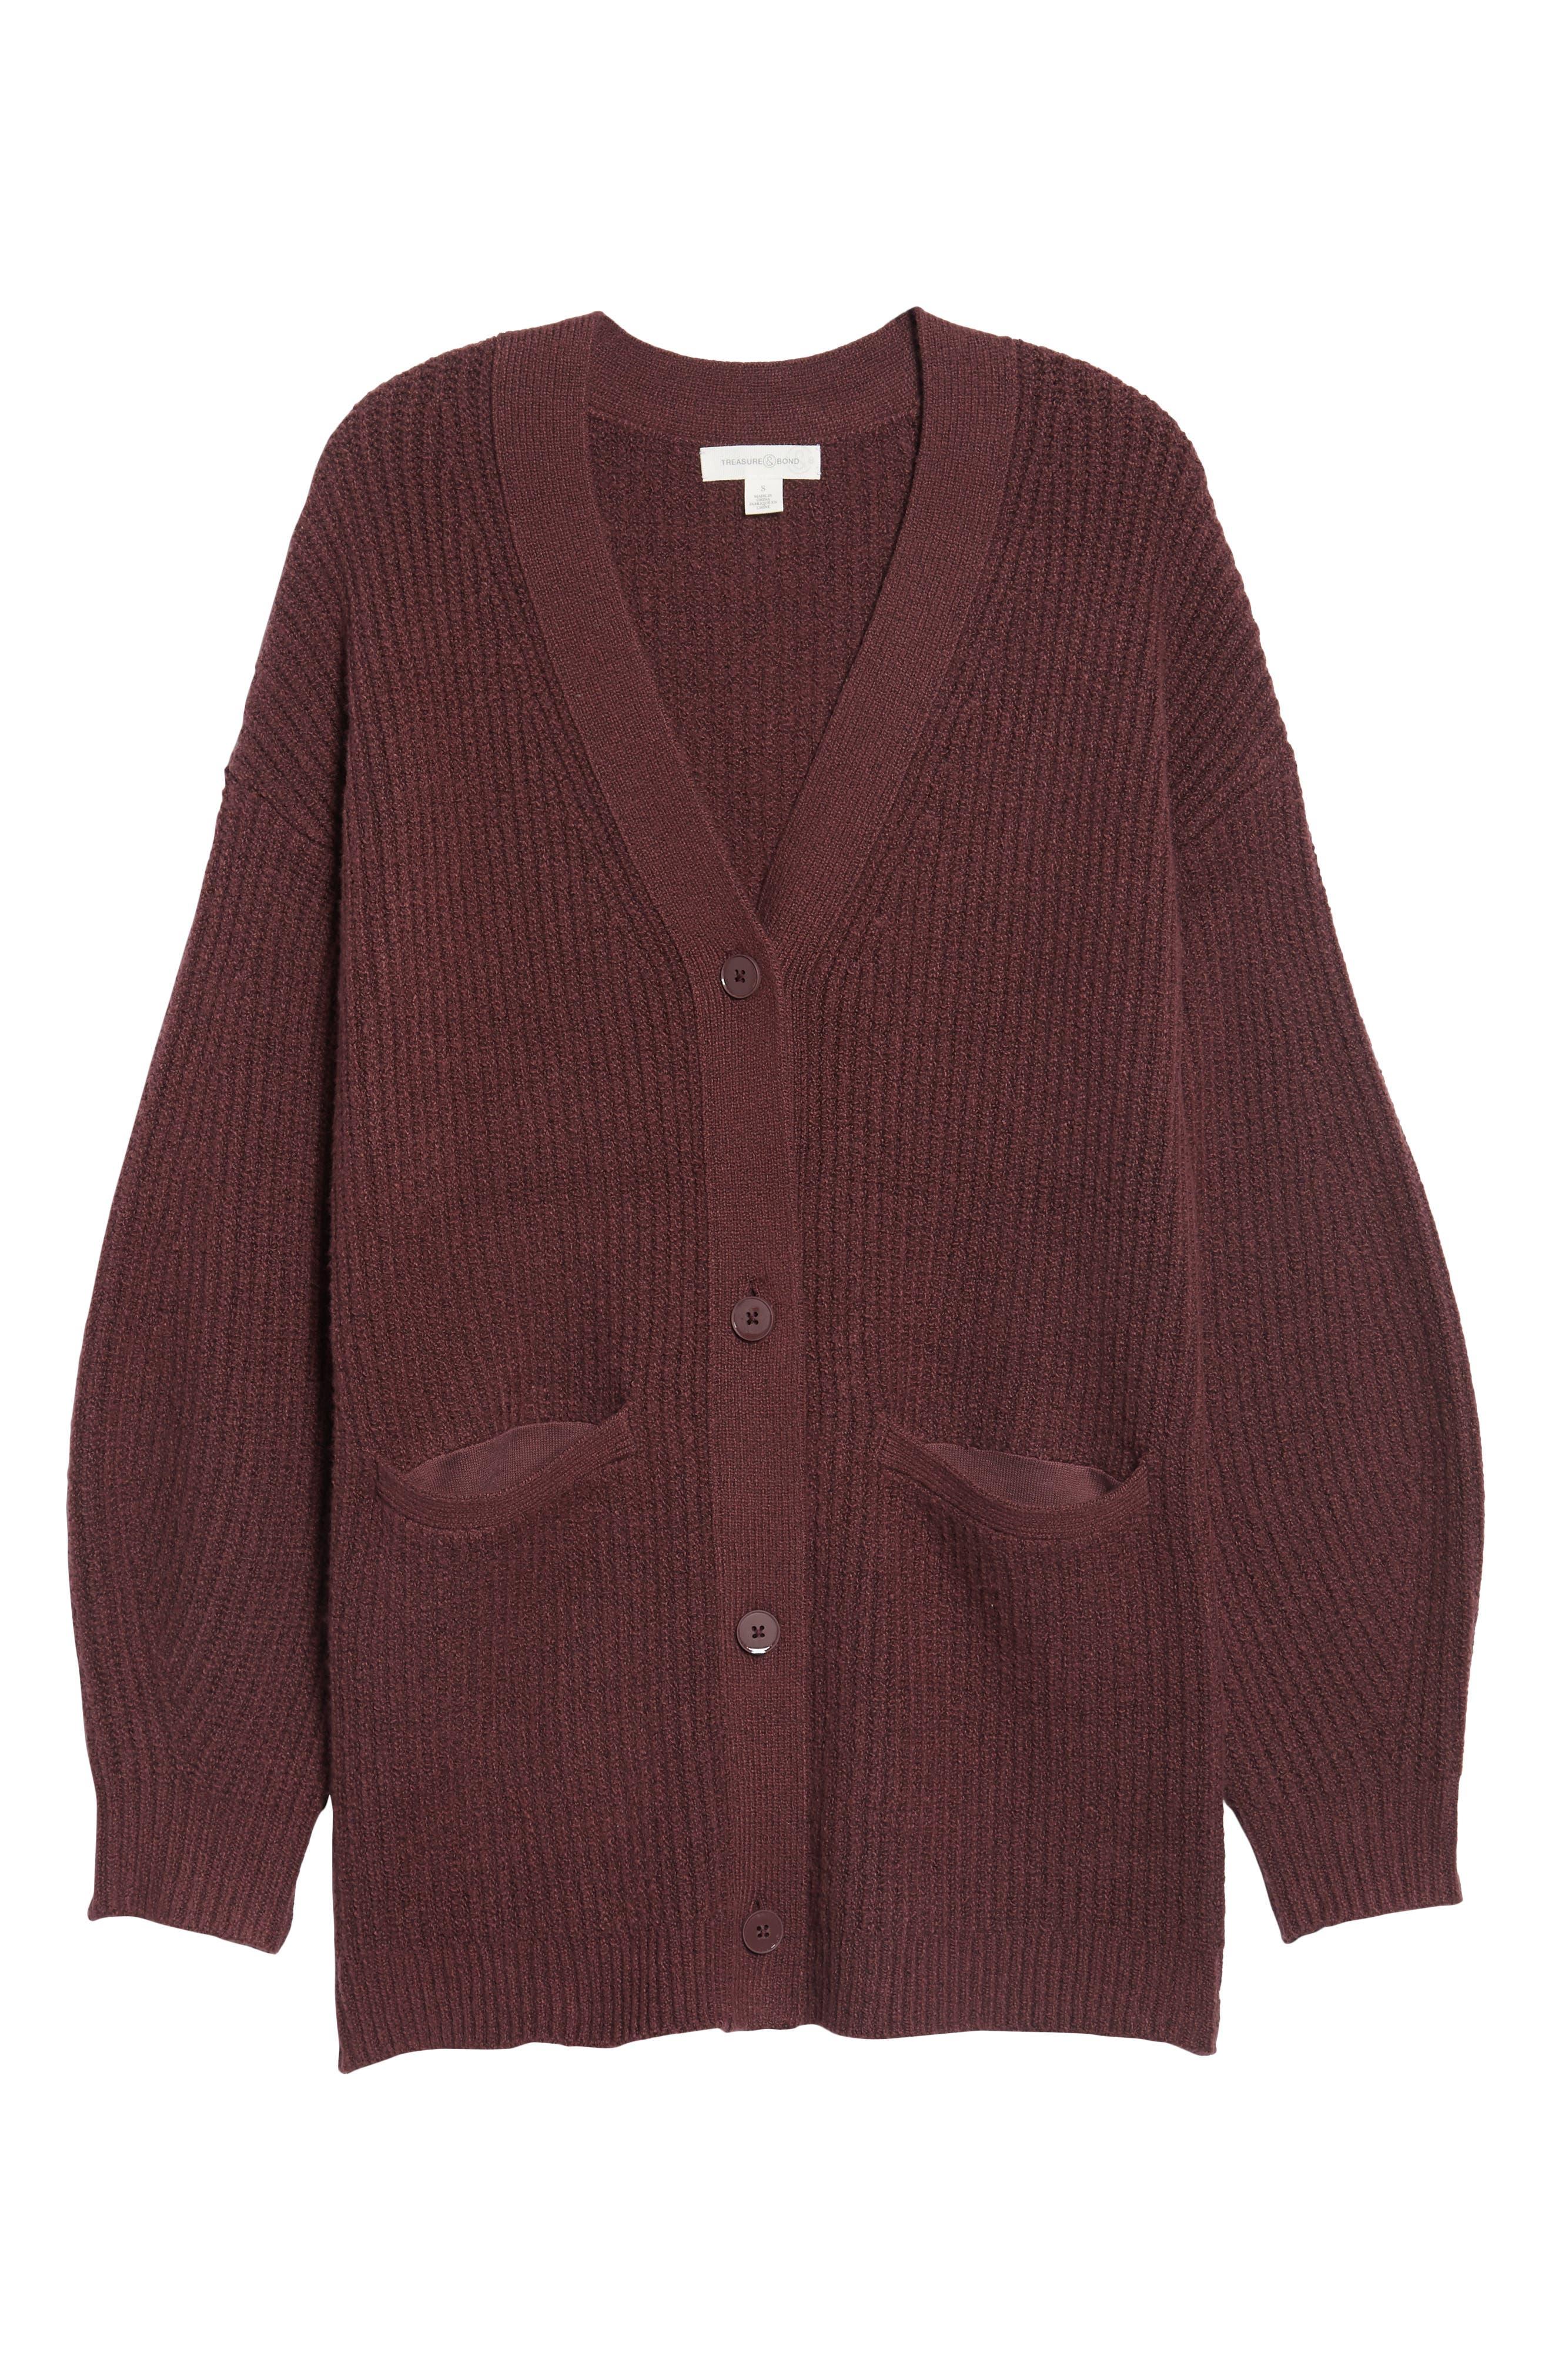 Ribbed Cardigan Sweater,                             Alternate thumbnail 6, color,                             930